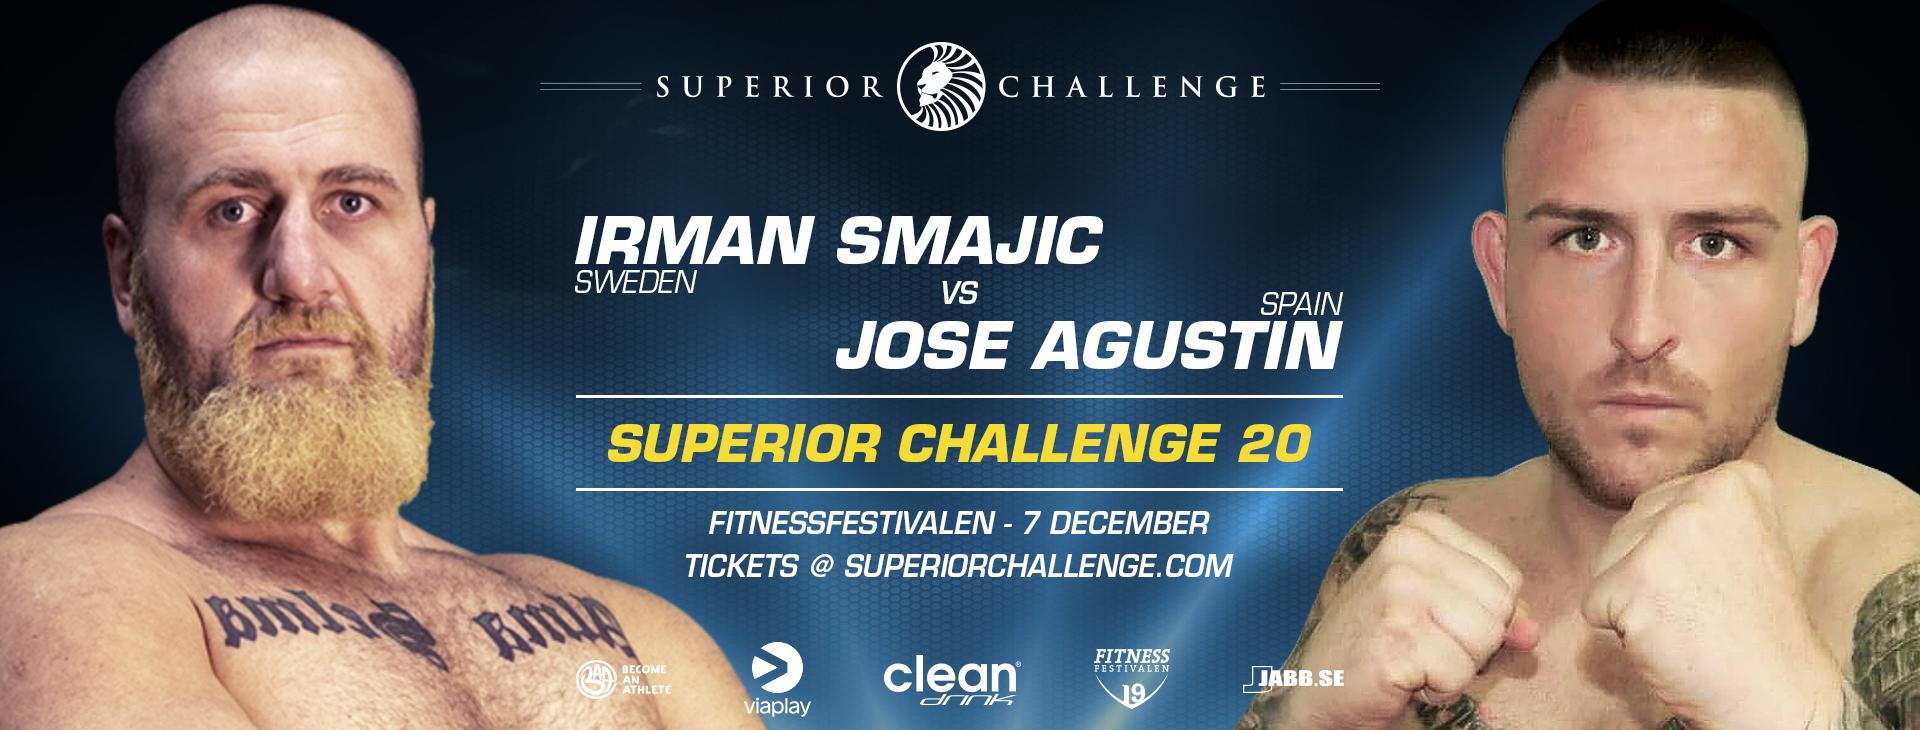 "Irman ""Magic"" Smajic faces Jose Agustin at Superior Challenge 20 – Fitnessfestivalen"